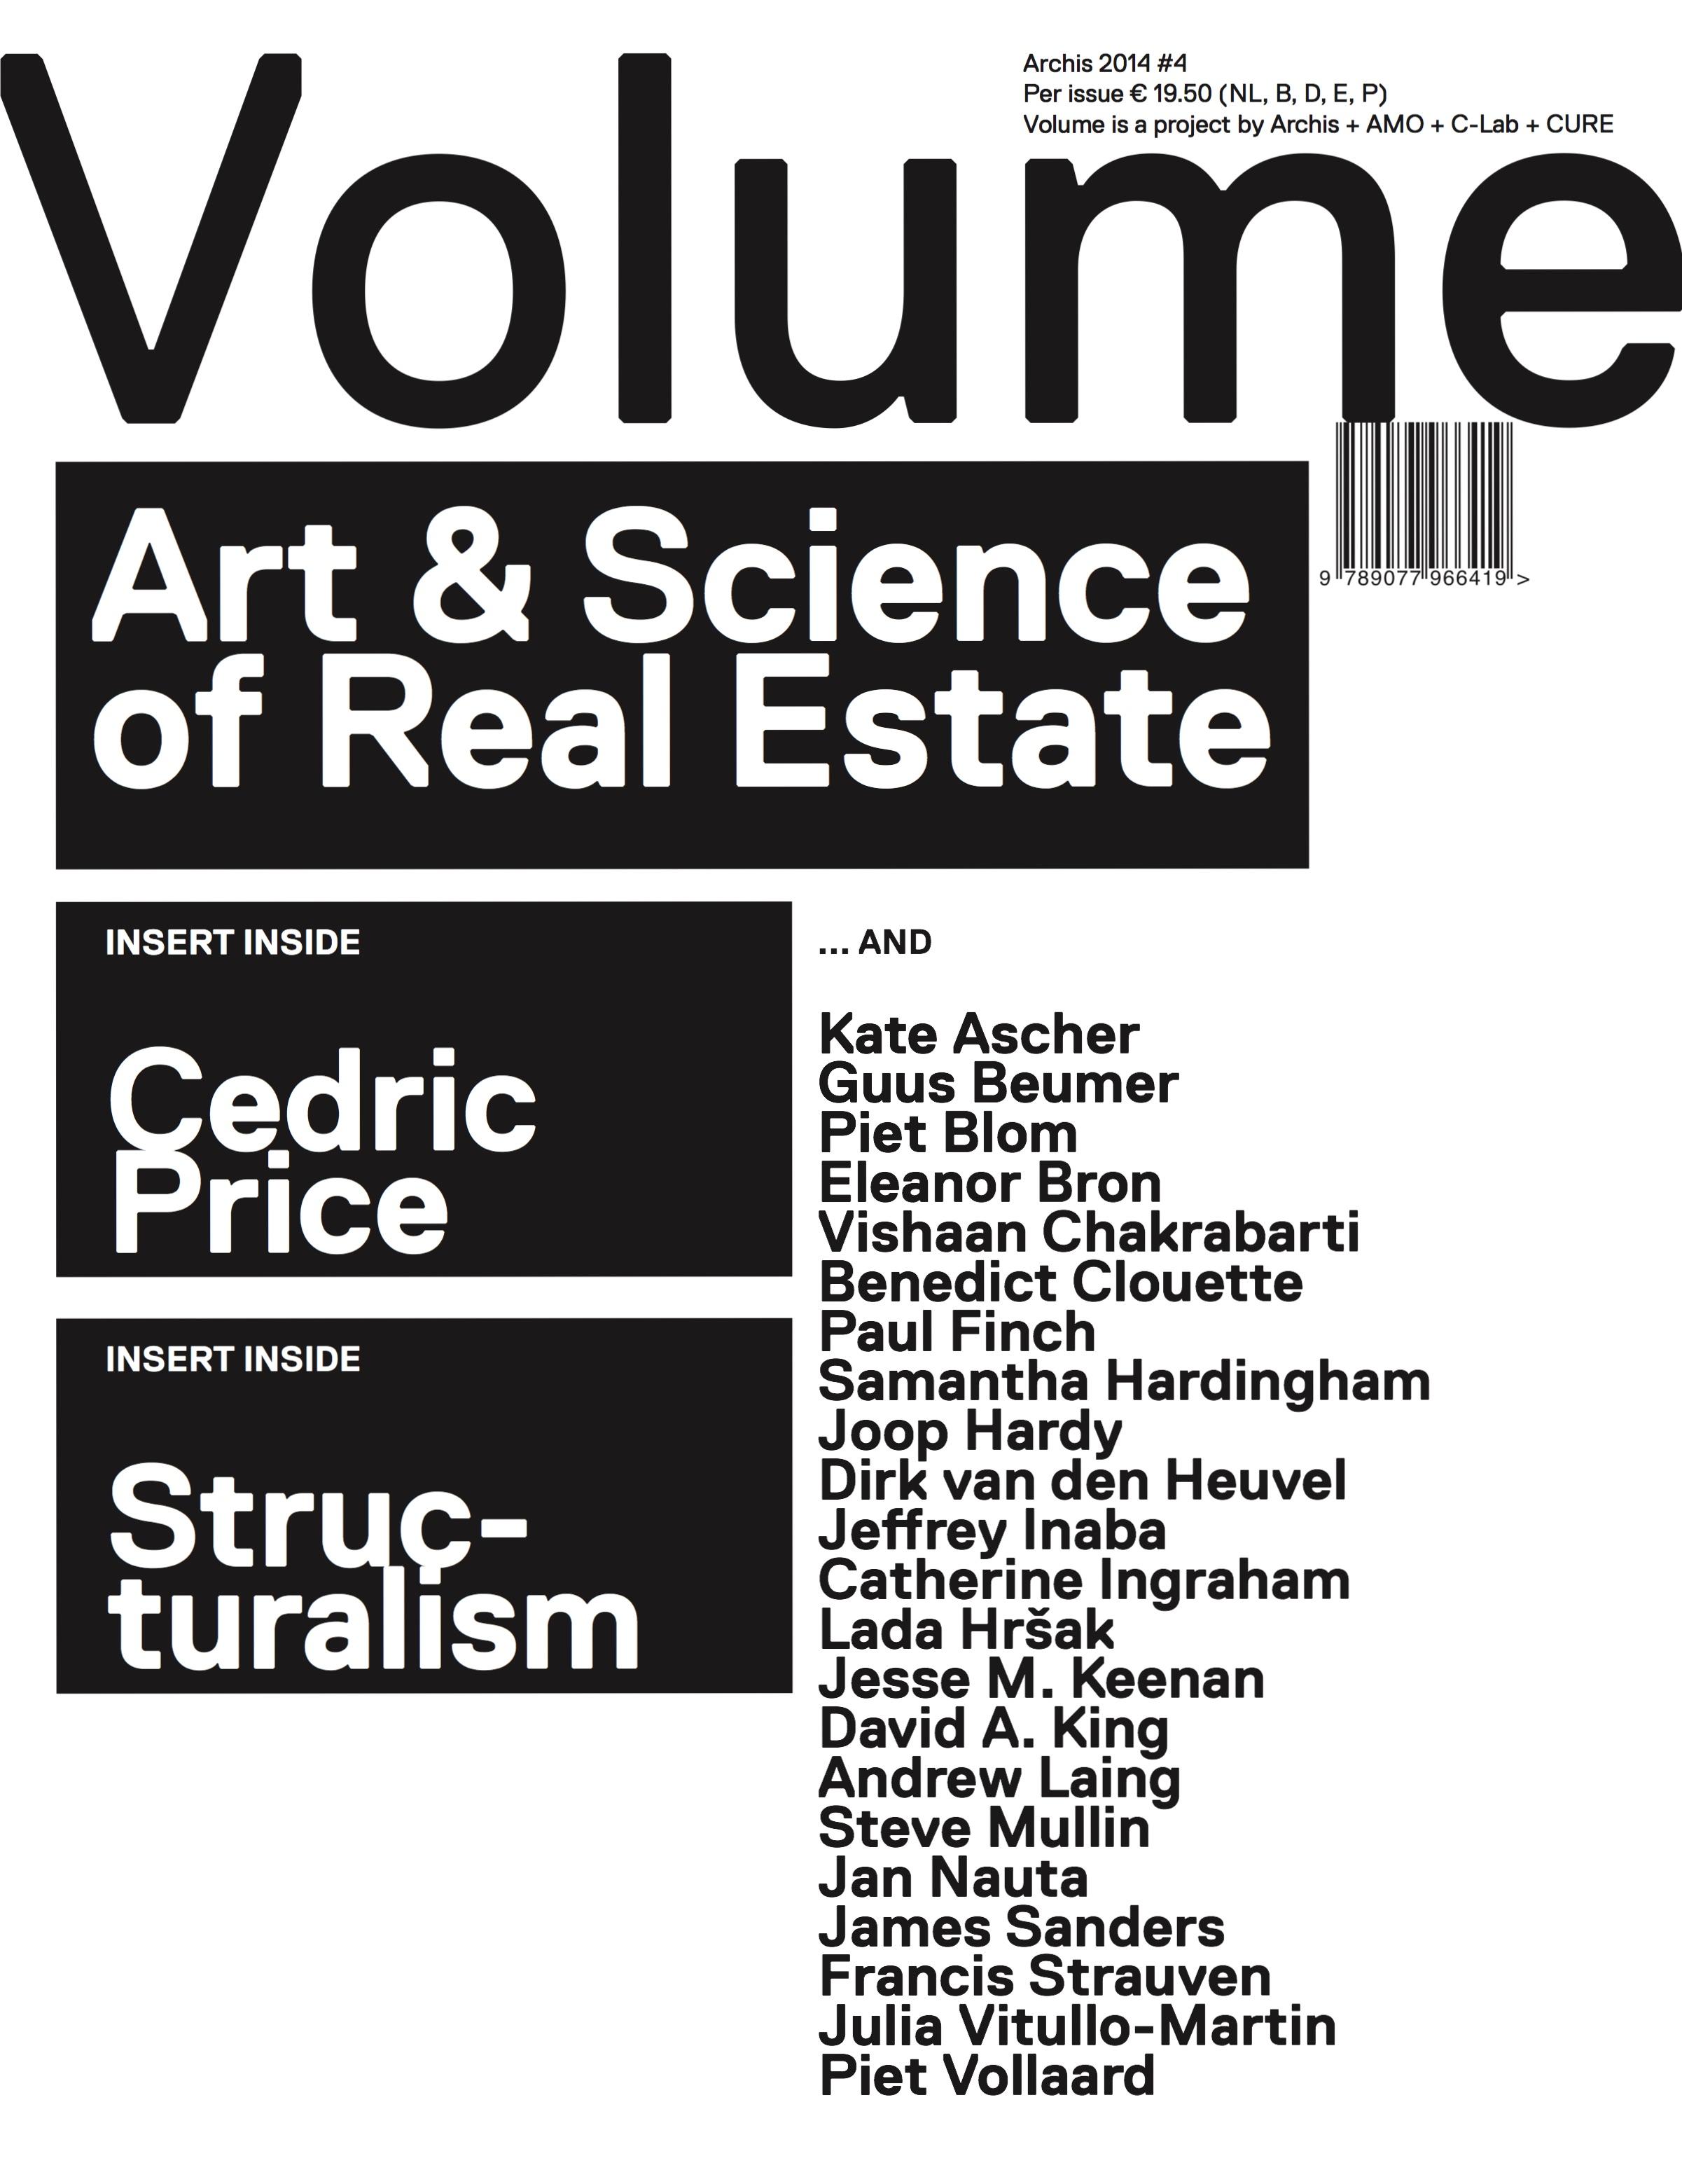 Volume #42: Art & Science of Real Estate